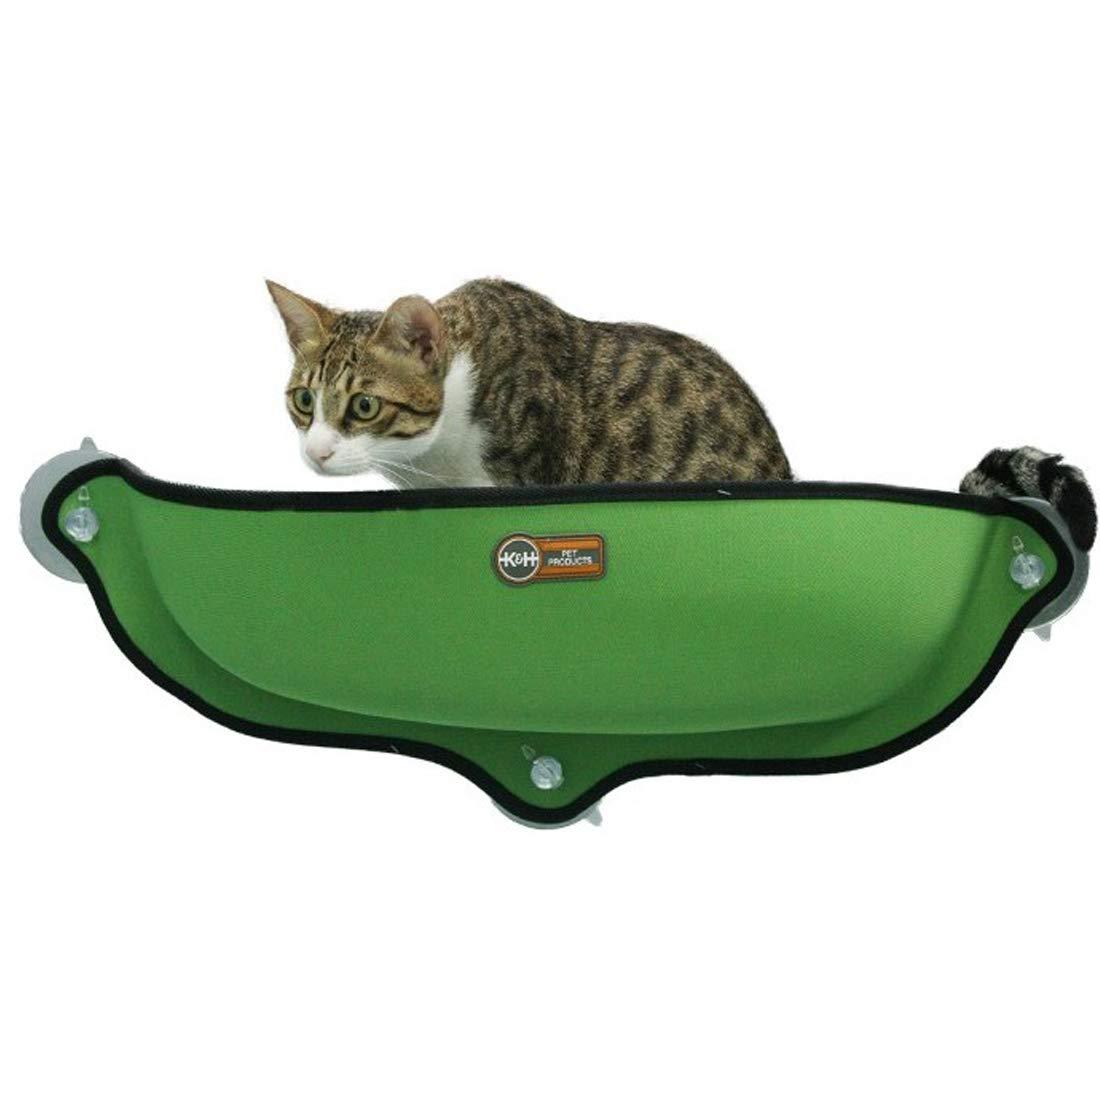 A Cat Window Hammock Pet Sunny Seat Window-Mounted Cat Bed Window Cat Bed Semi-Closed Deep Sleep Fossa Sunbathing Cat Mat Sunbathing + Daydreaming 68 × 28CM Can Bear 15KG,A